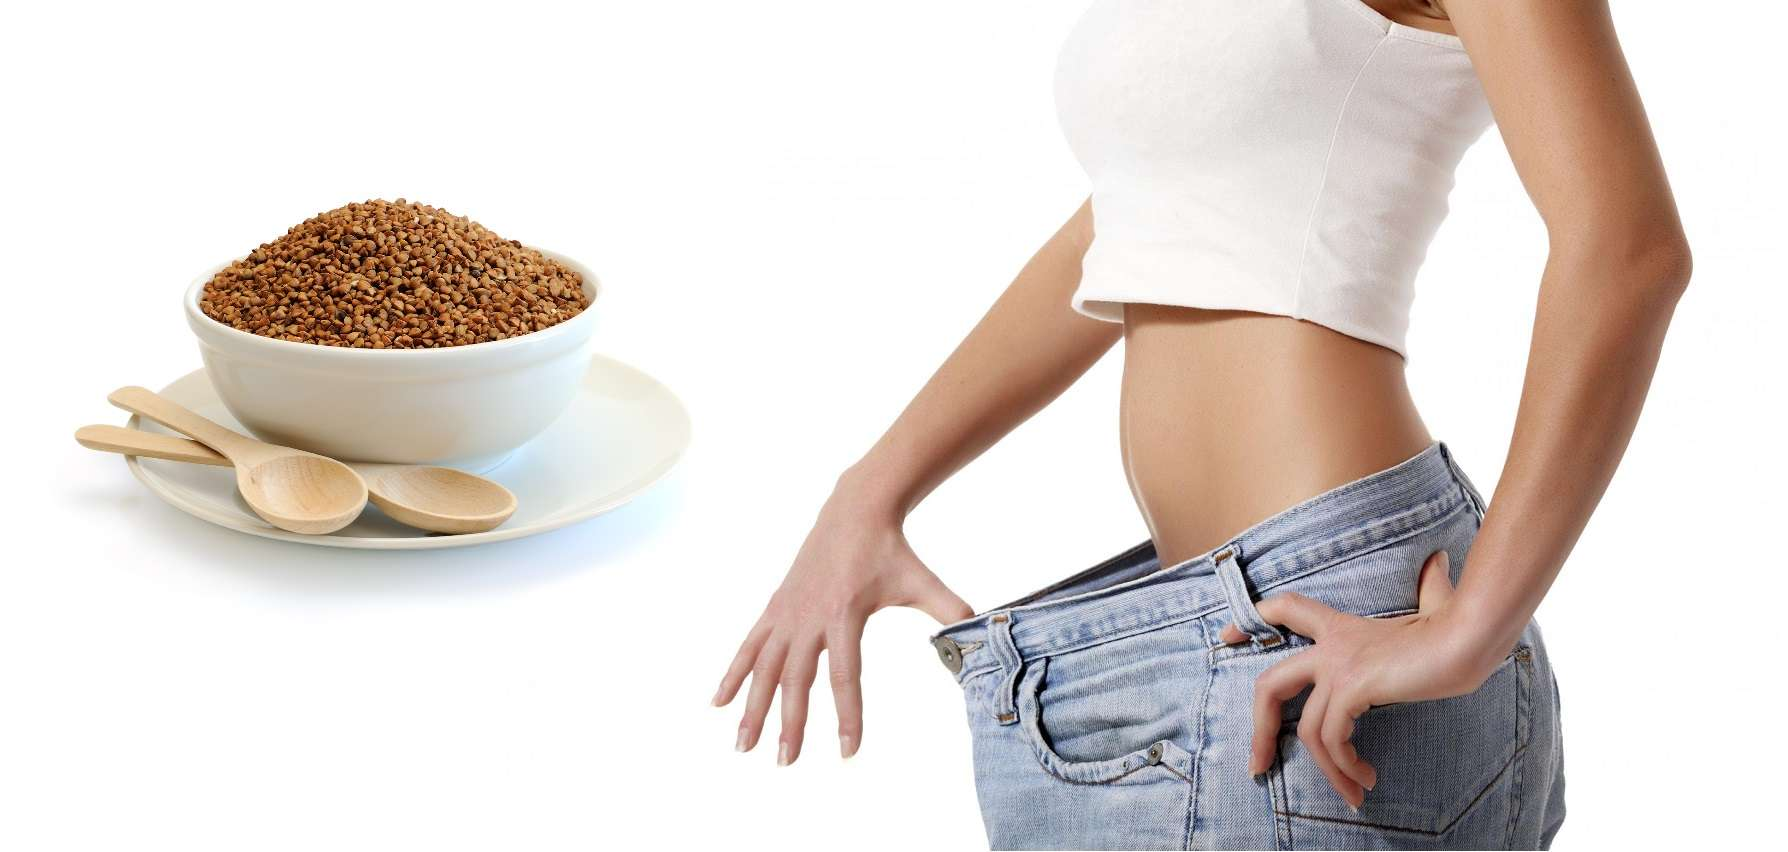 Похудении на гречневой диете за неделю